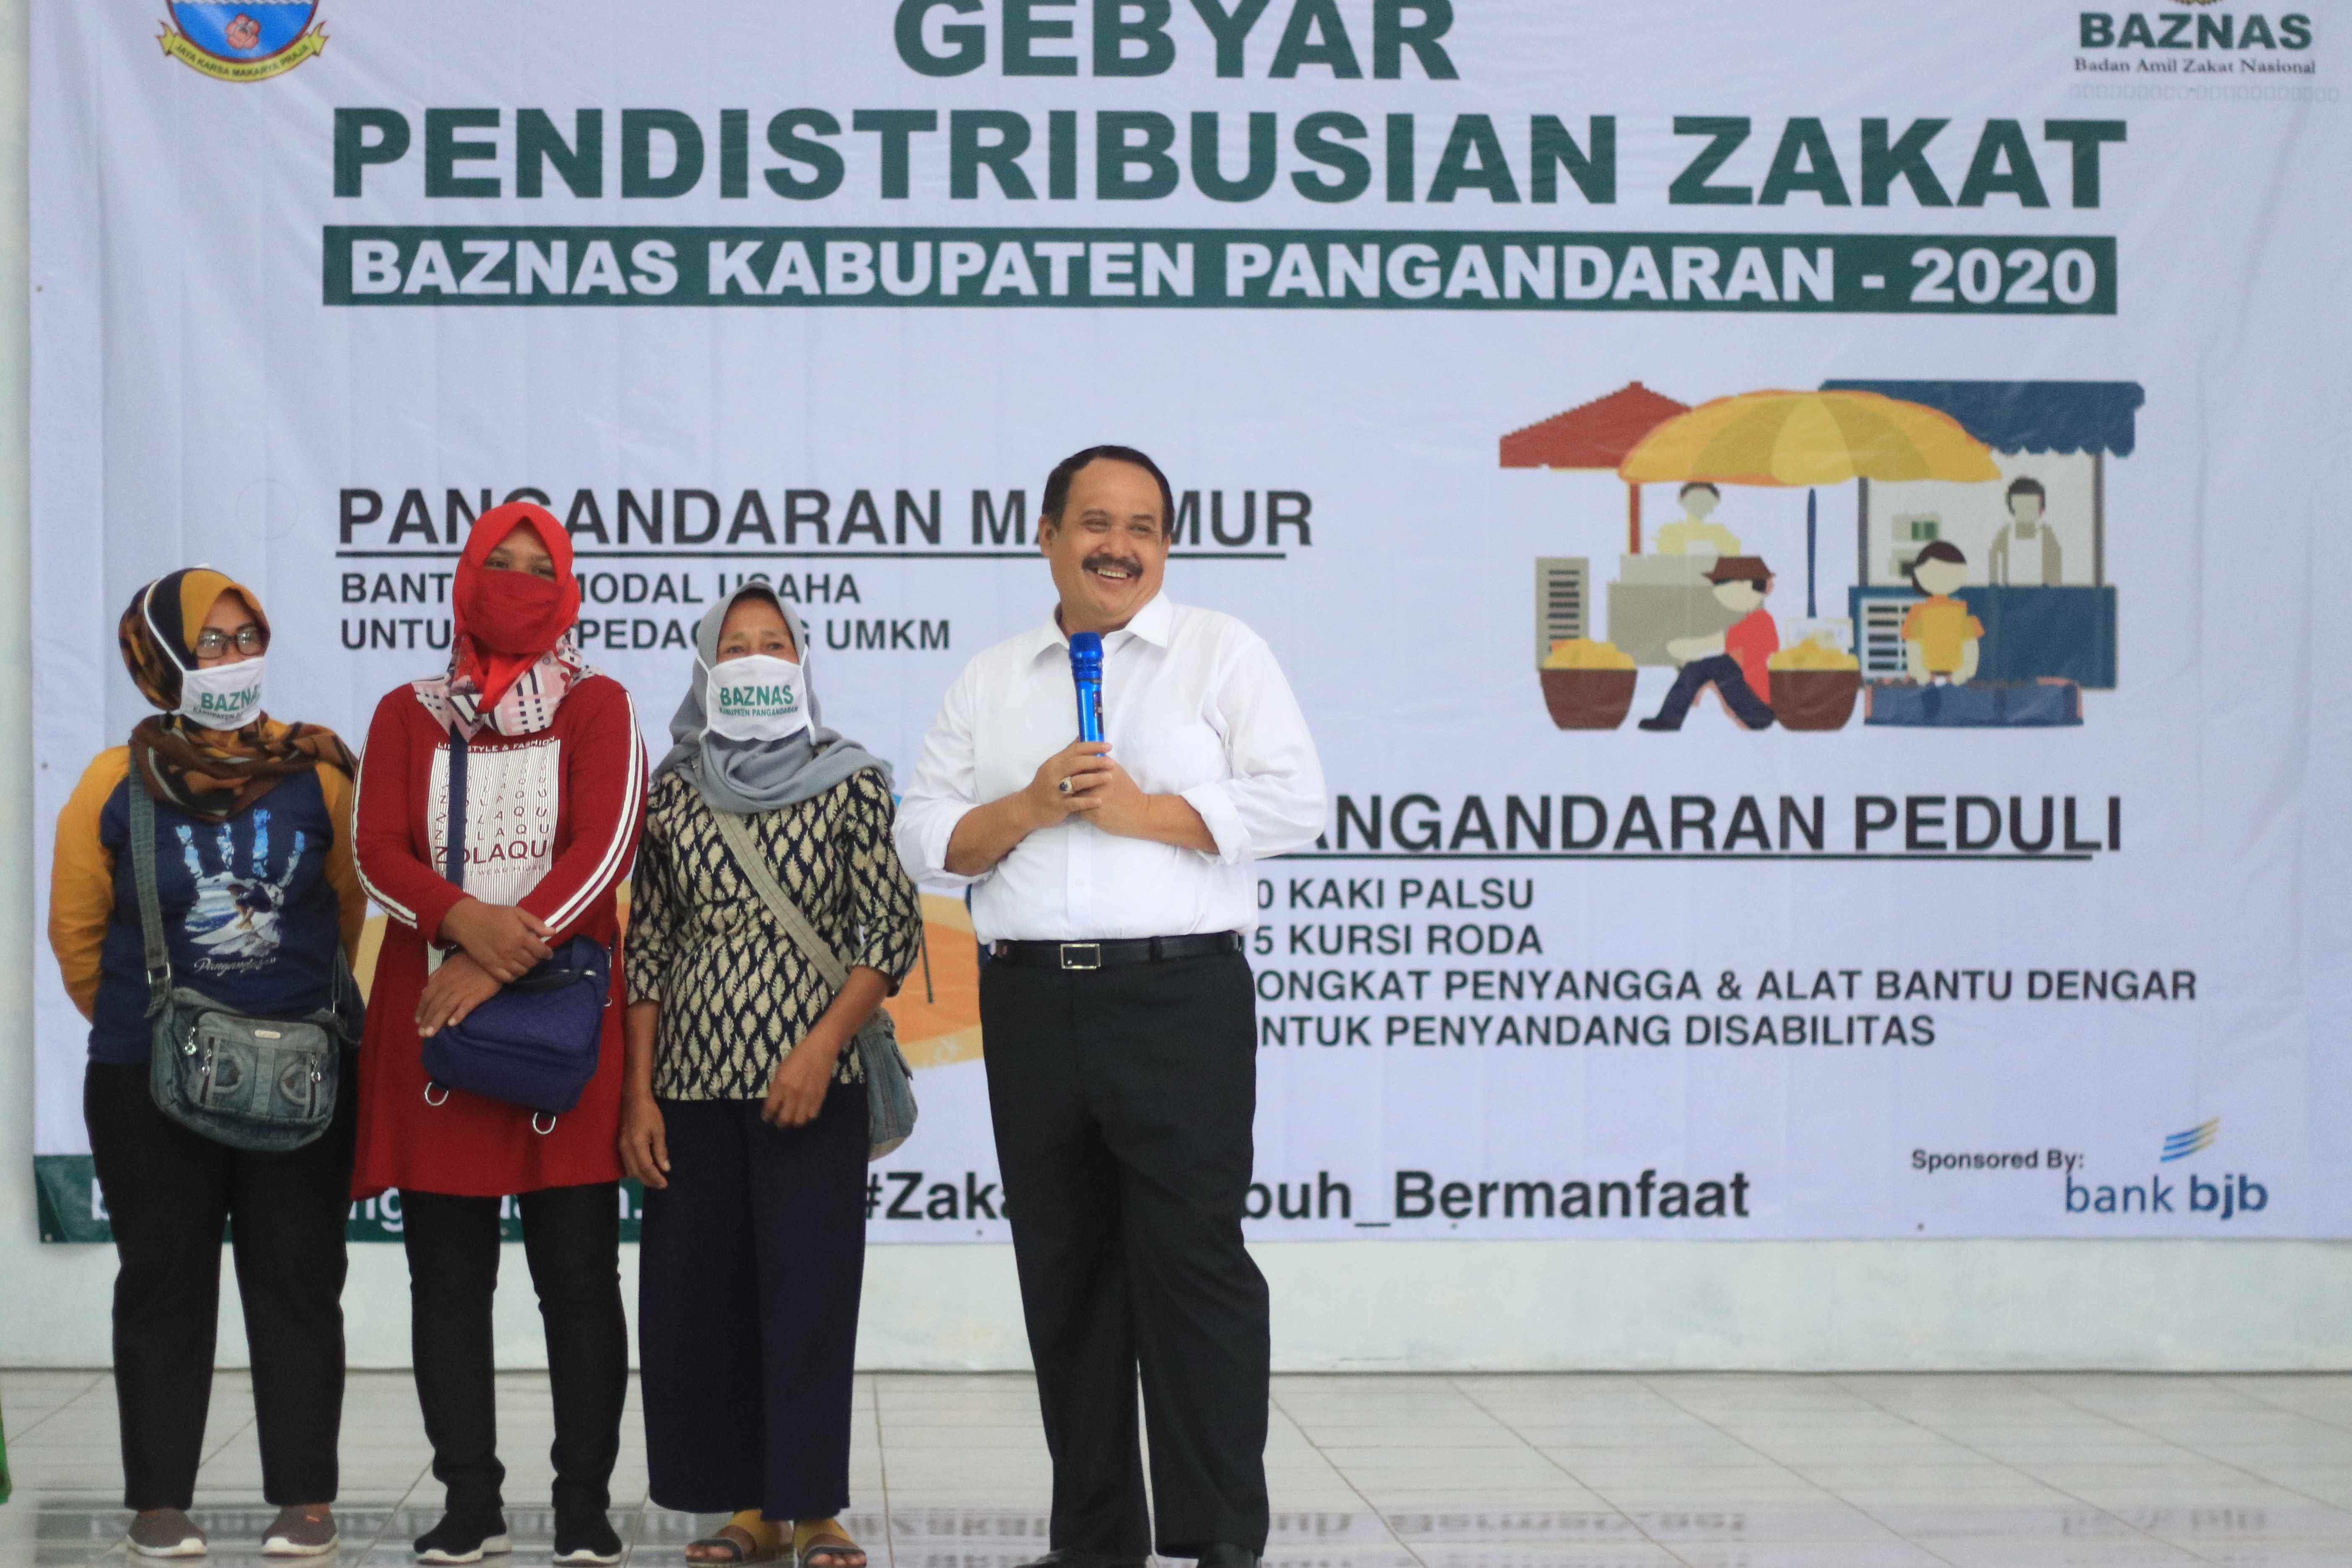 Gebyar Pendistribusian Zakat, Infaq dan Shodaqoh (ZIS) Tahun 2020